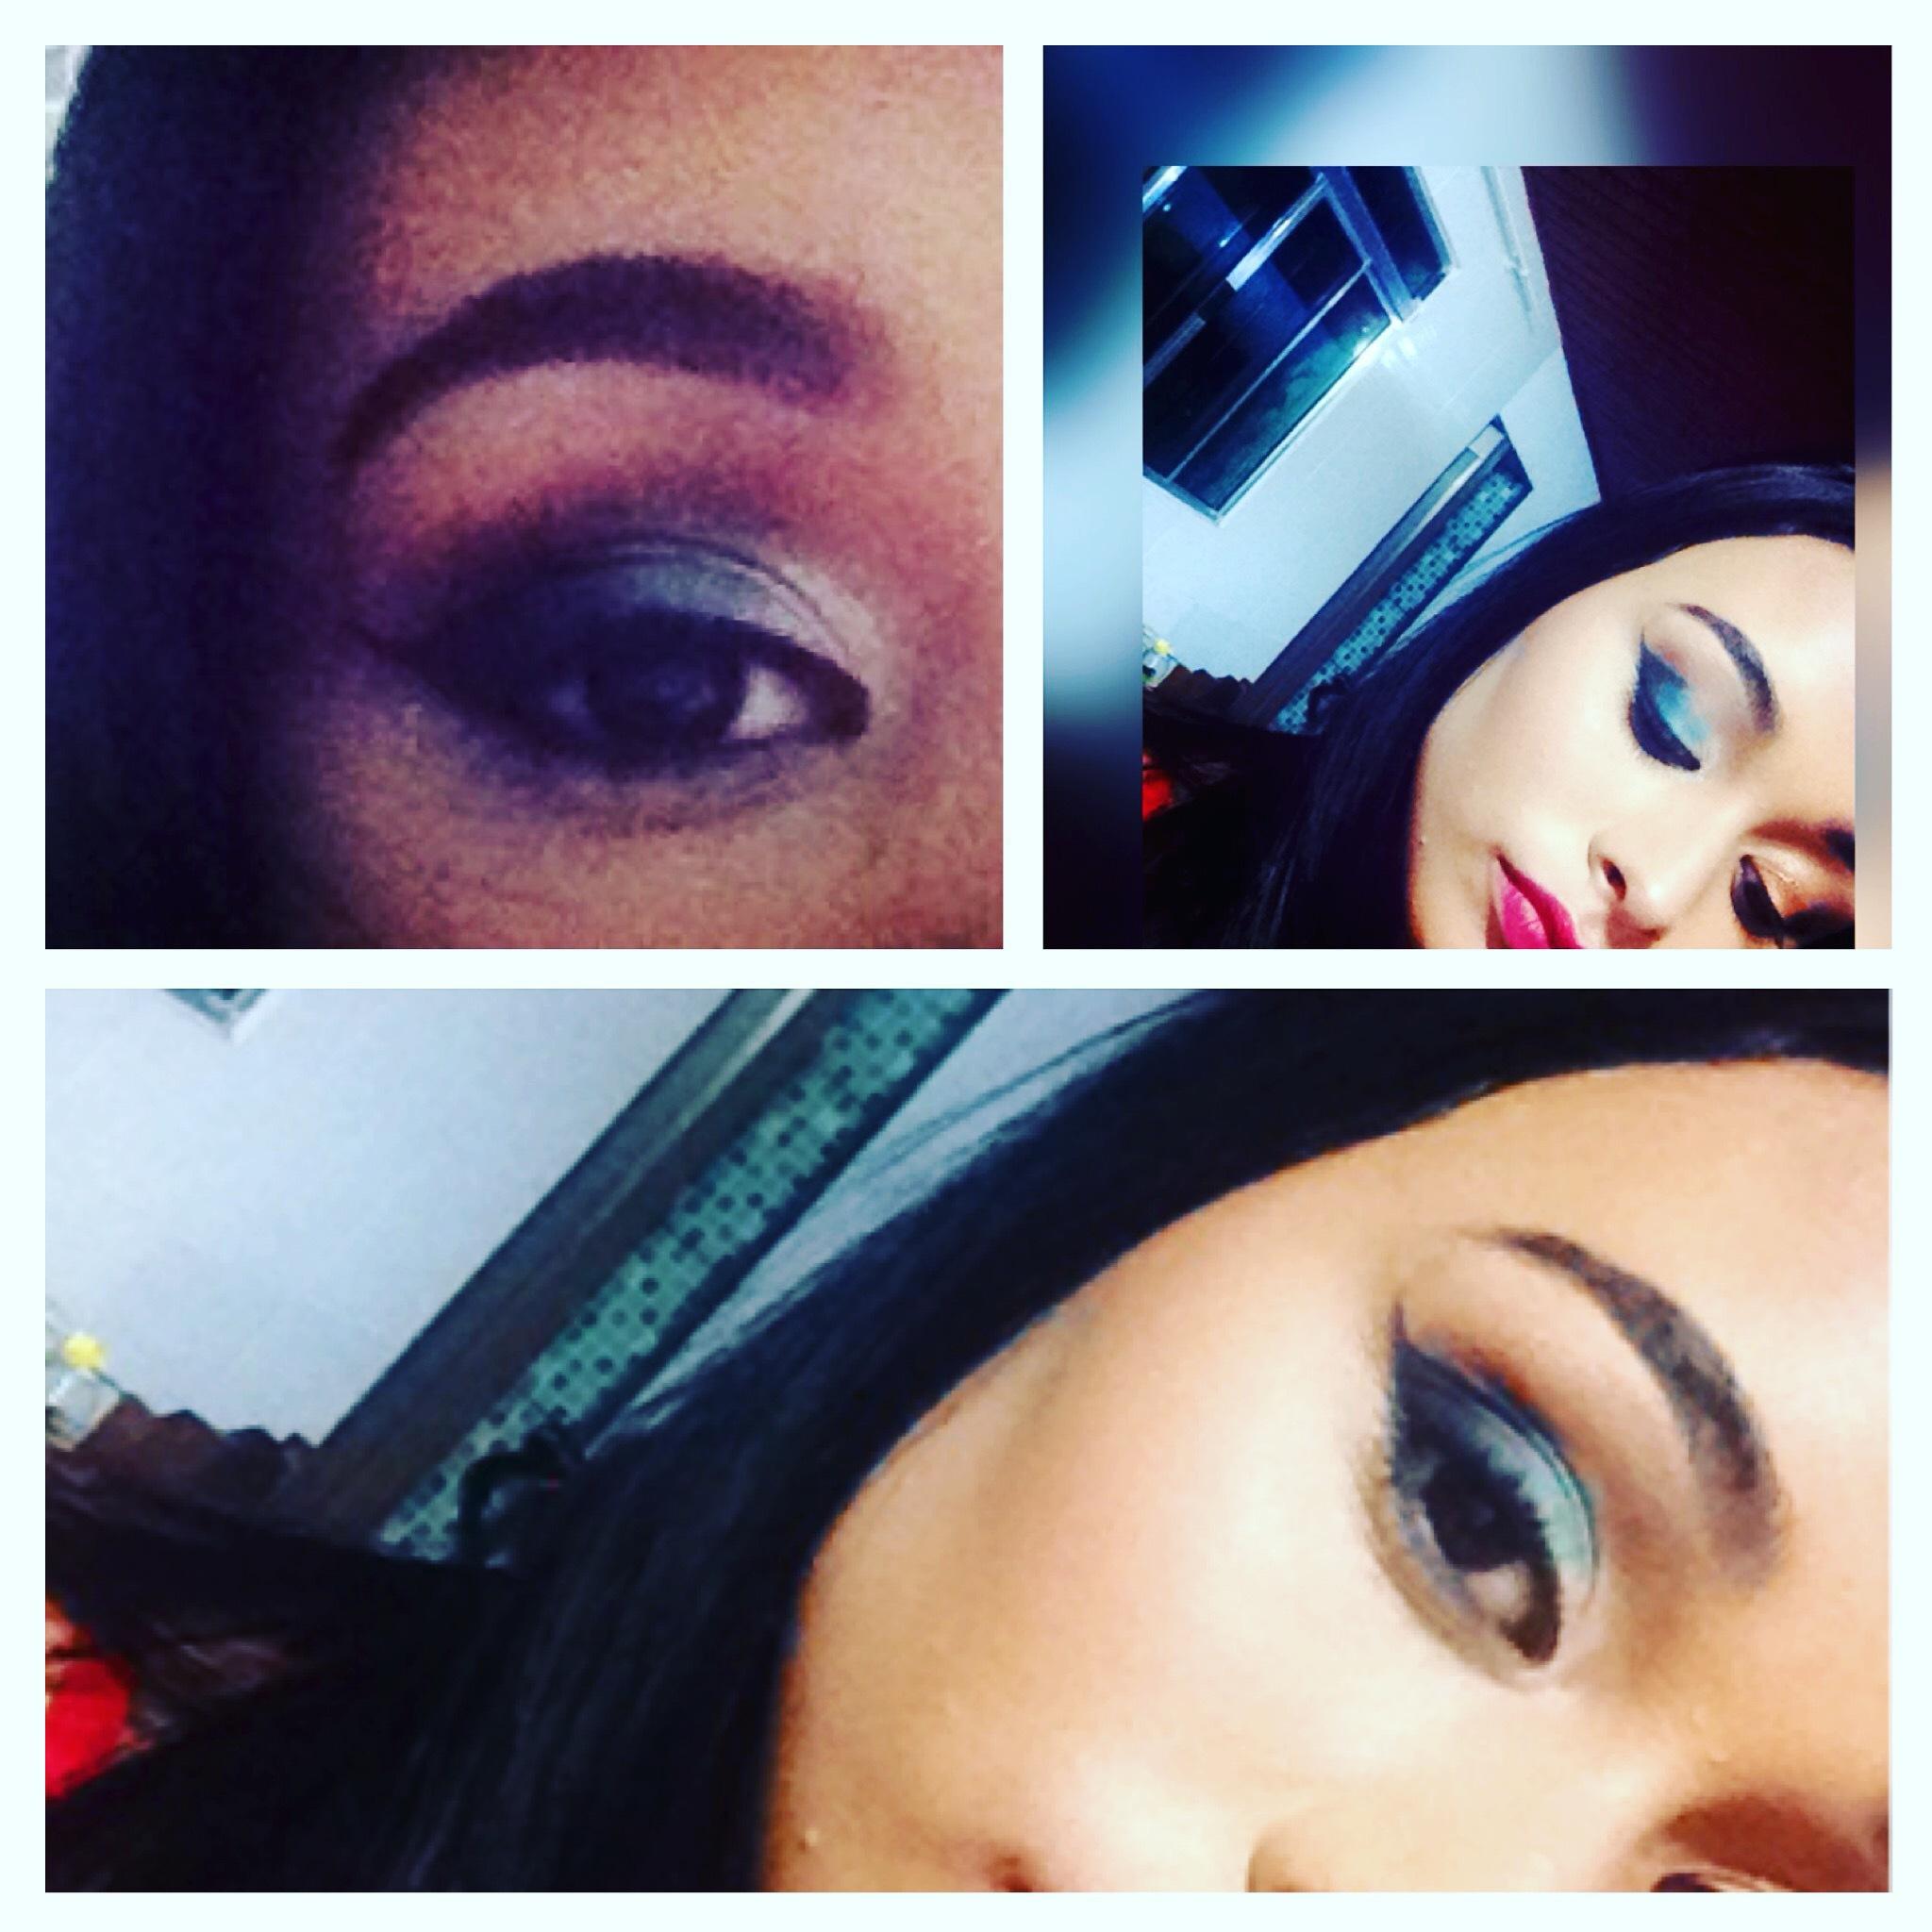 #makeAzul #love #makeup maquiagem maquiador(a)